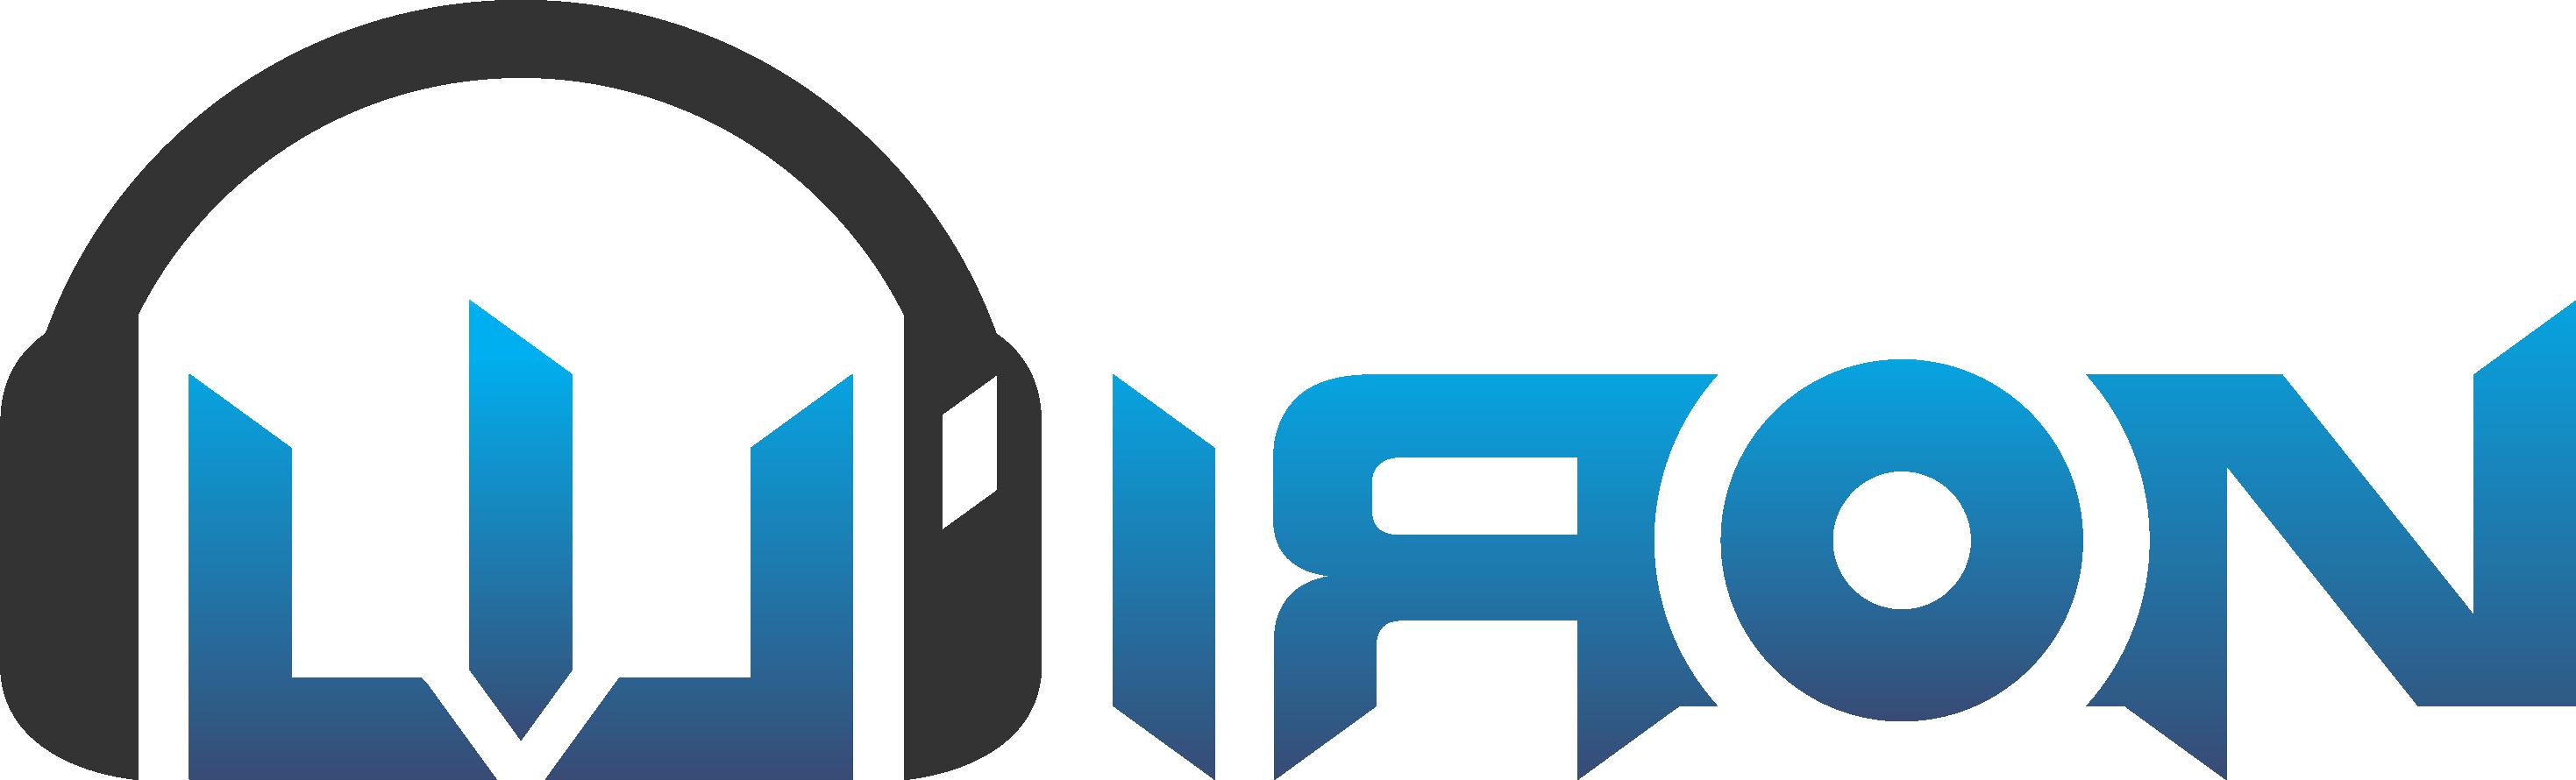 Create a DJ Logo for a newcomer DJ